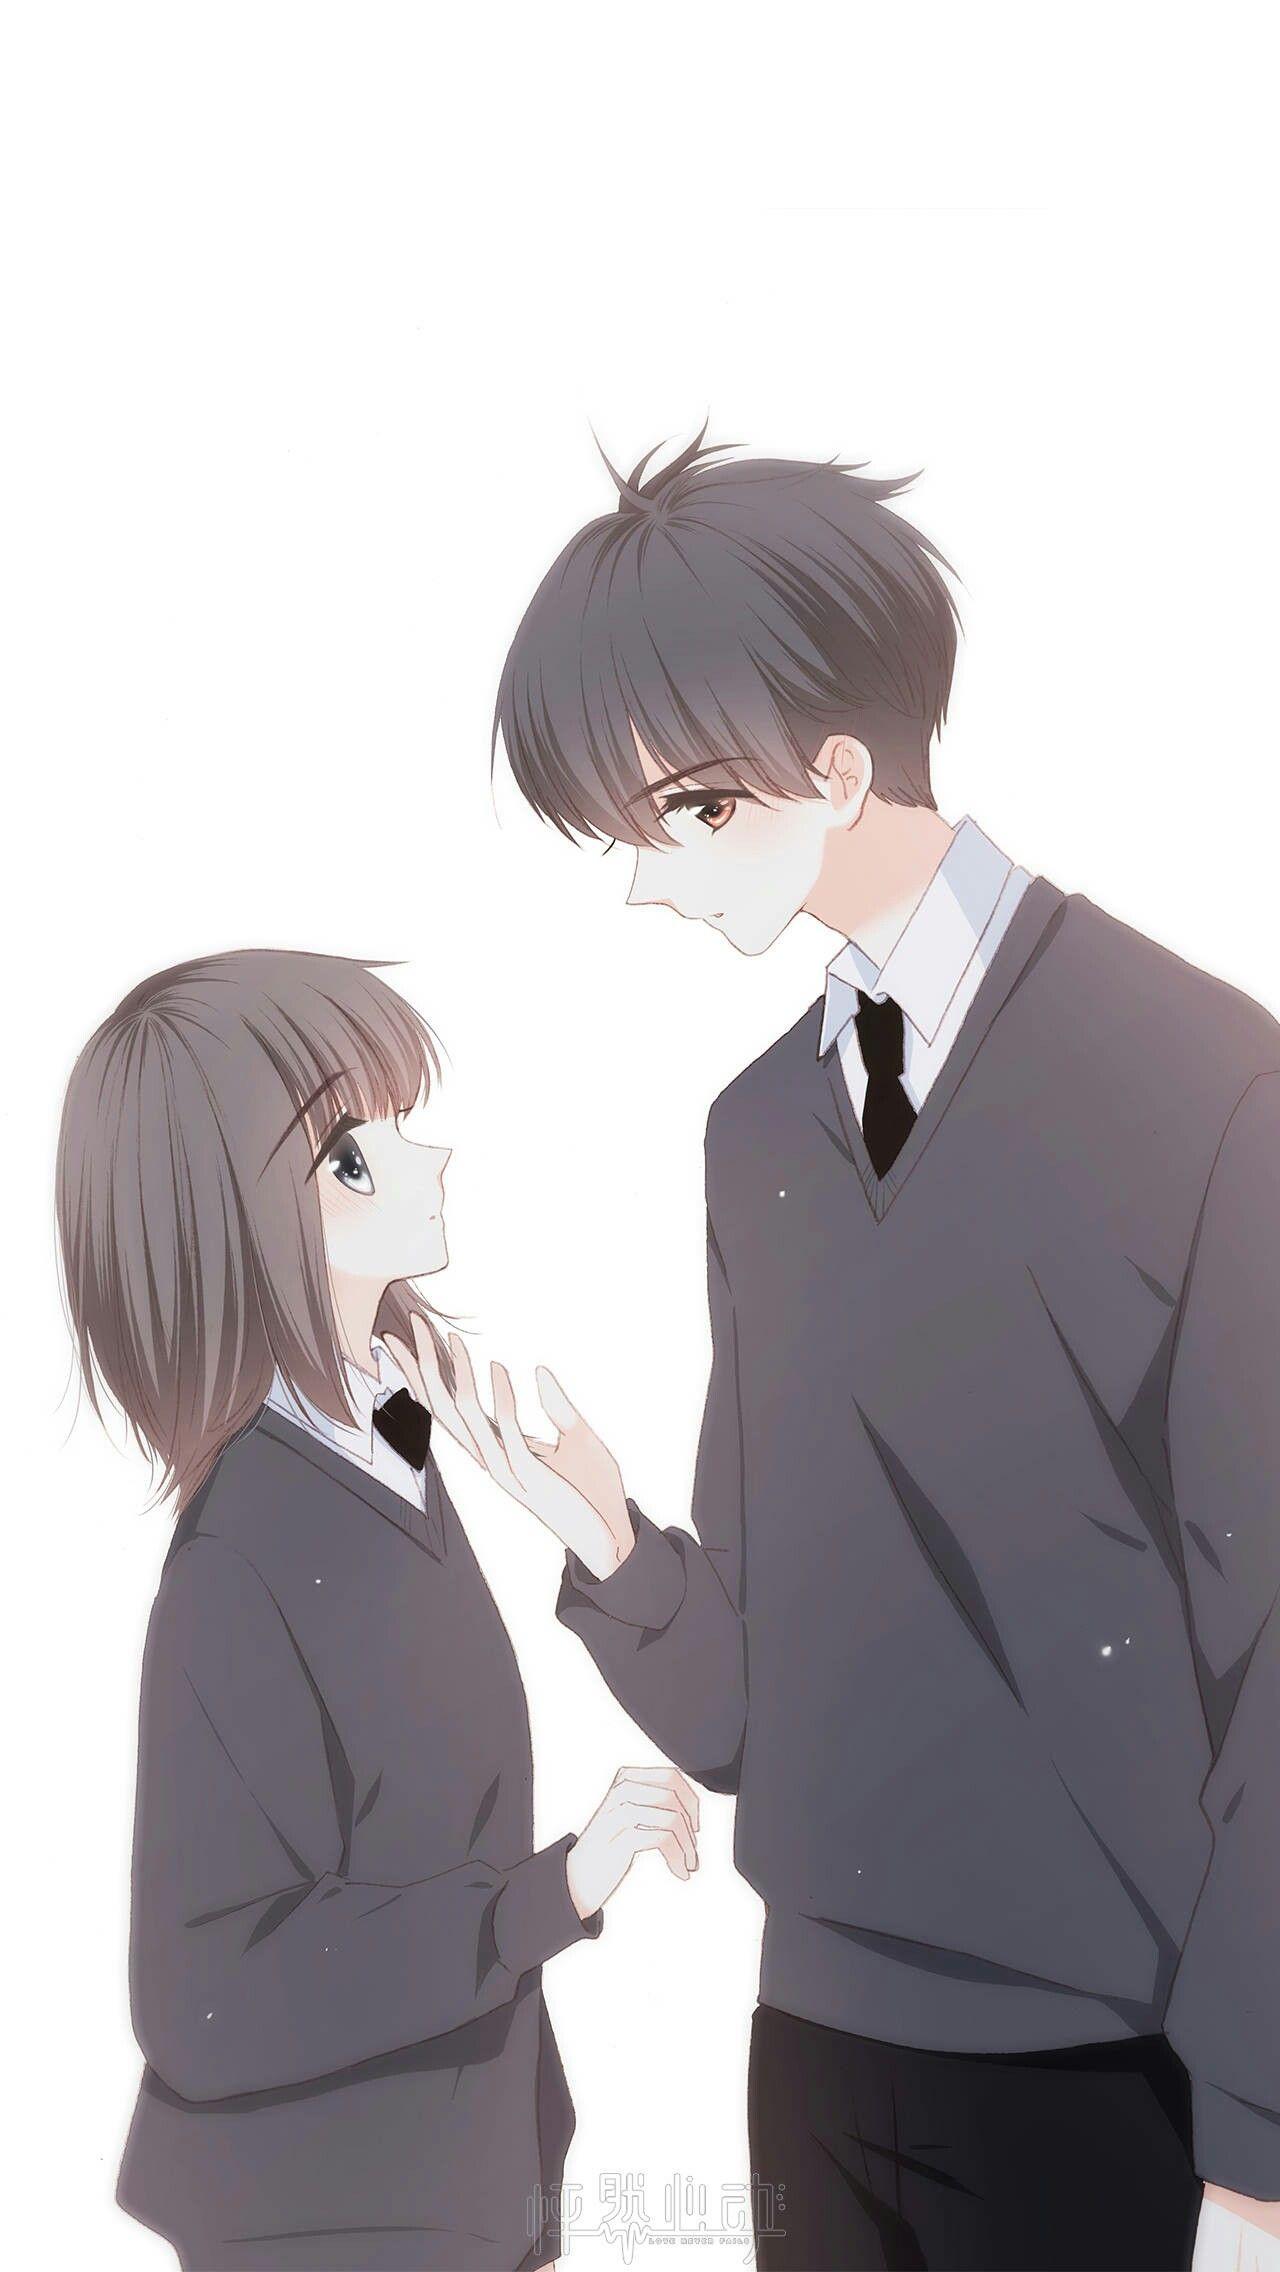 Pin Oleh Ni Nin Di Comics Gadis Animasi Pasangan Animasi Gambar Anime